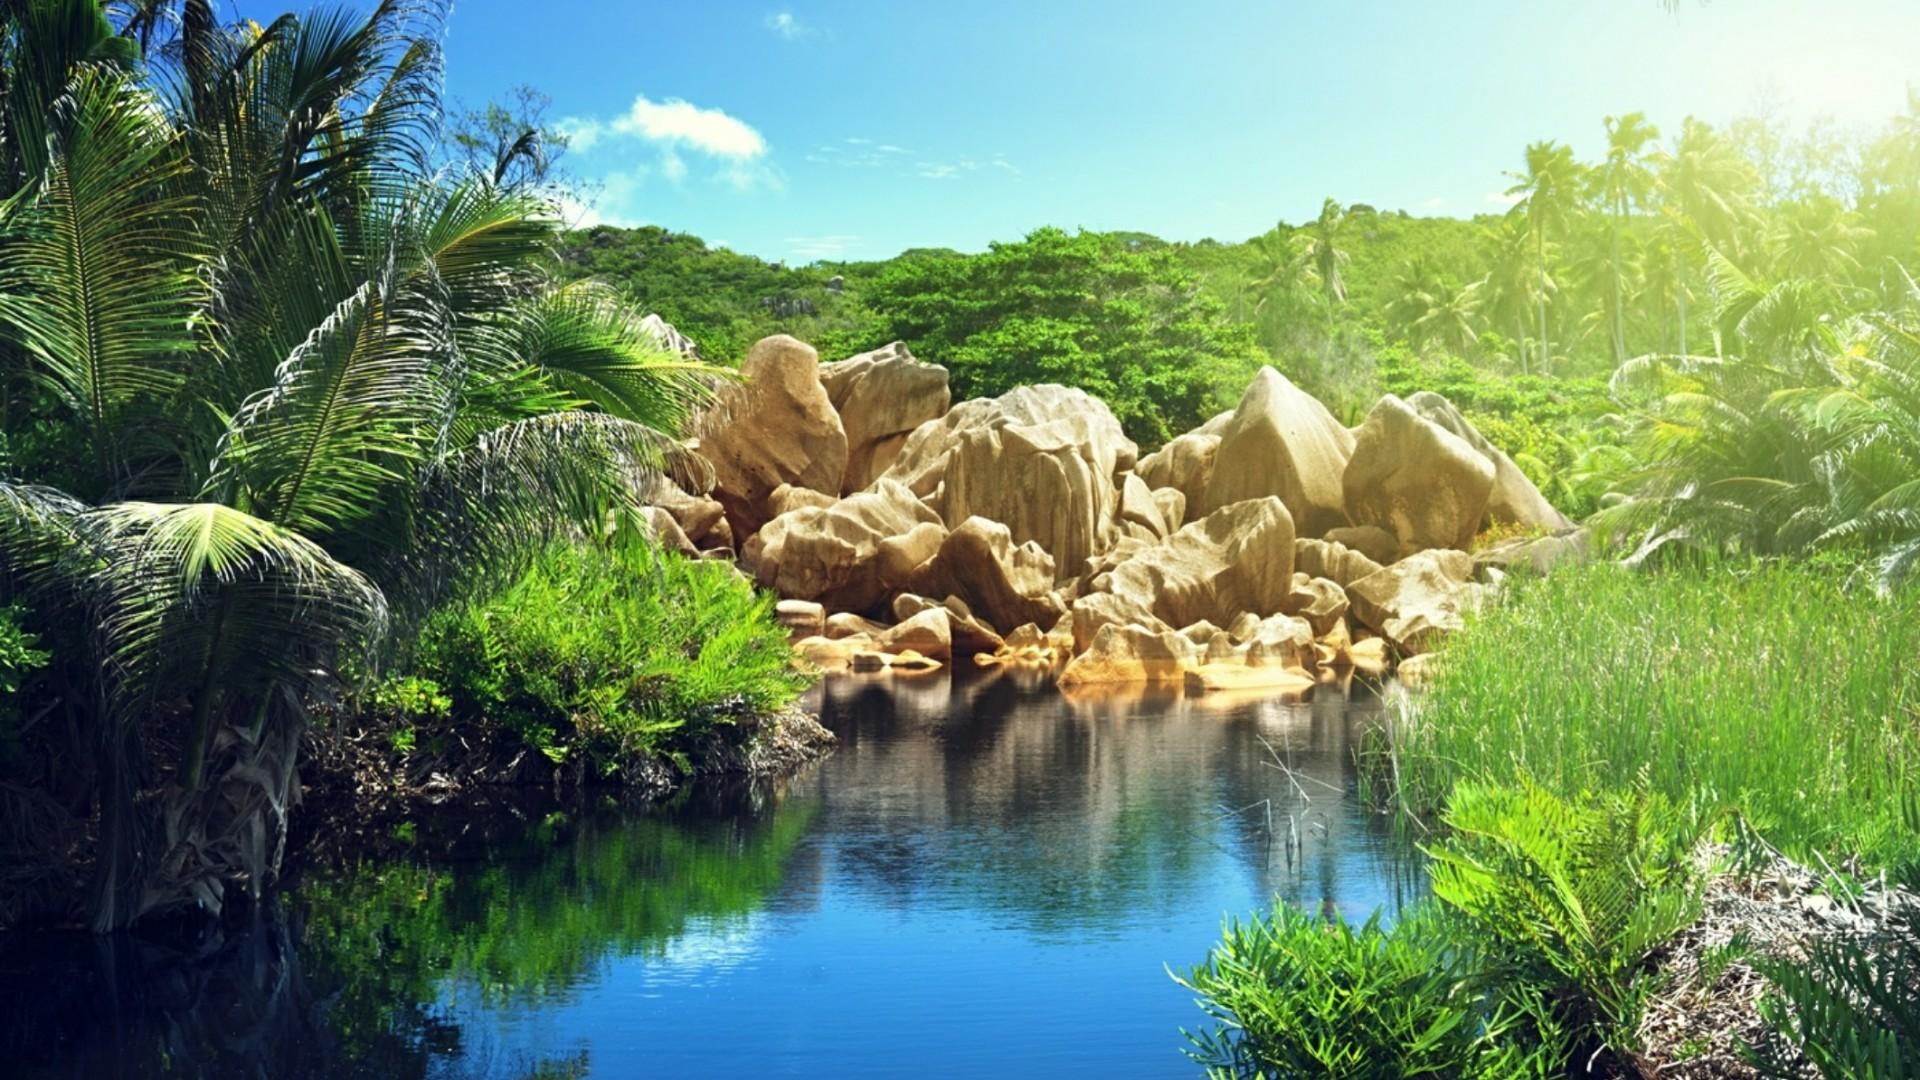 Lake in the jungle (La Digue, Seychelles) wallpaper